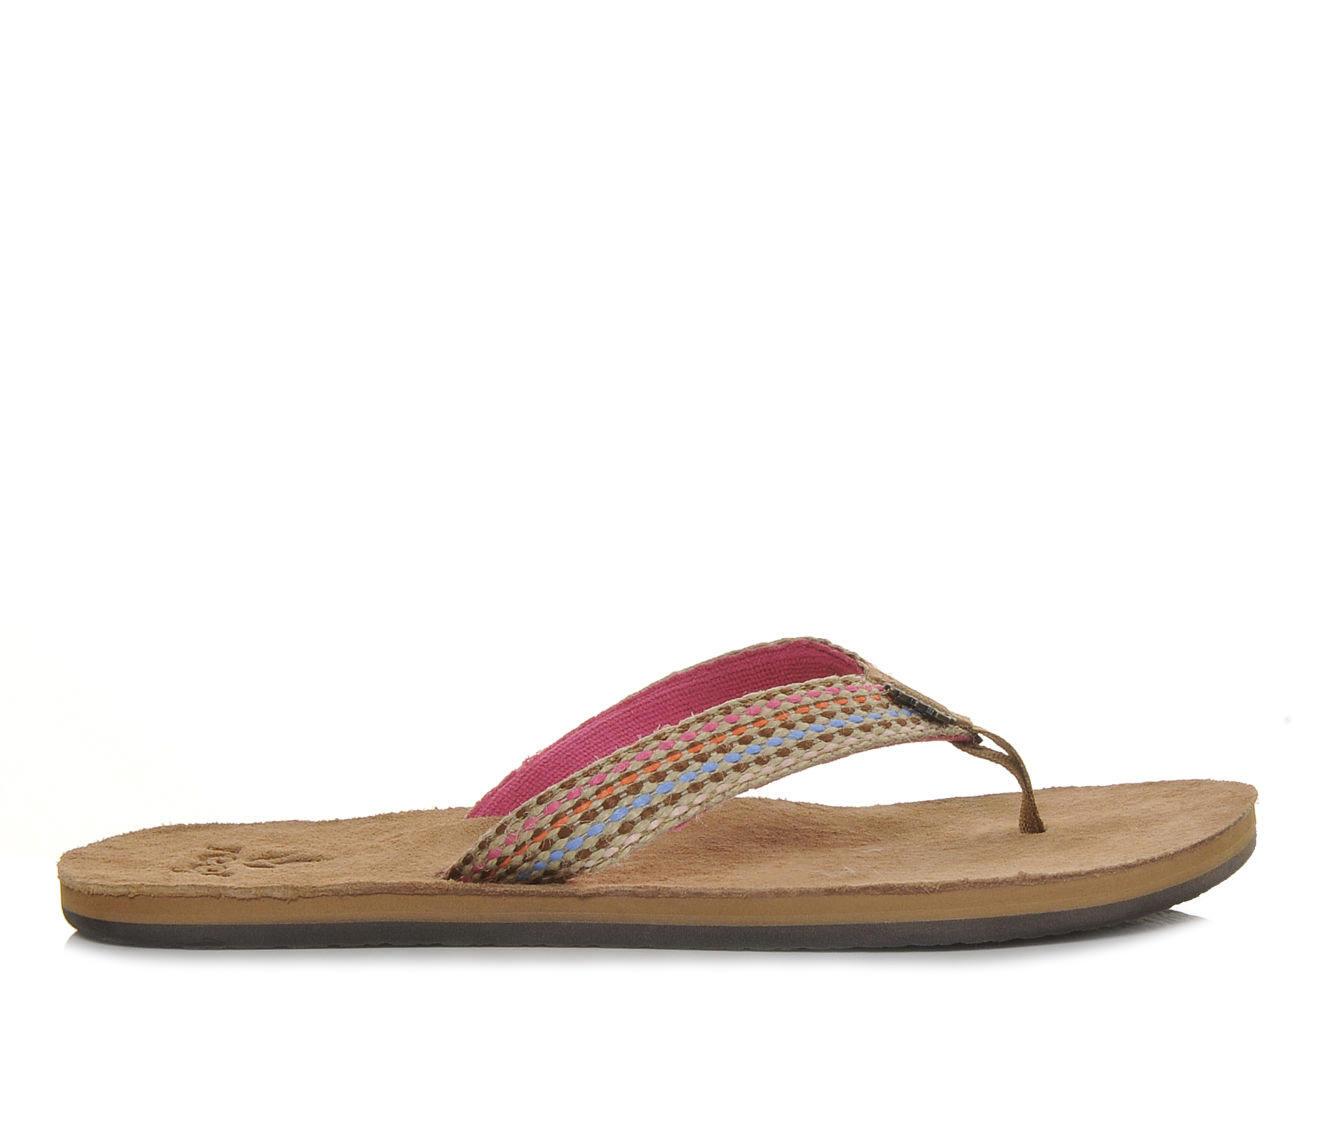 Women's Reef Gypsy Love Sandals (Brown)